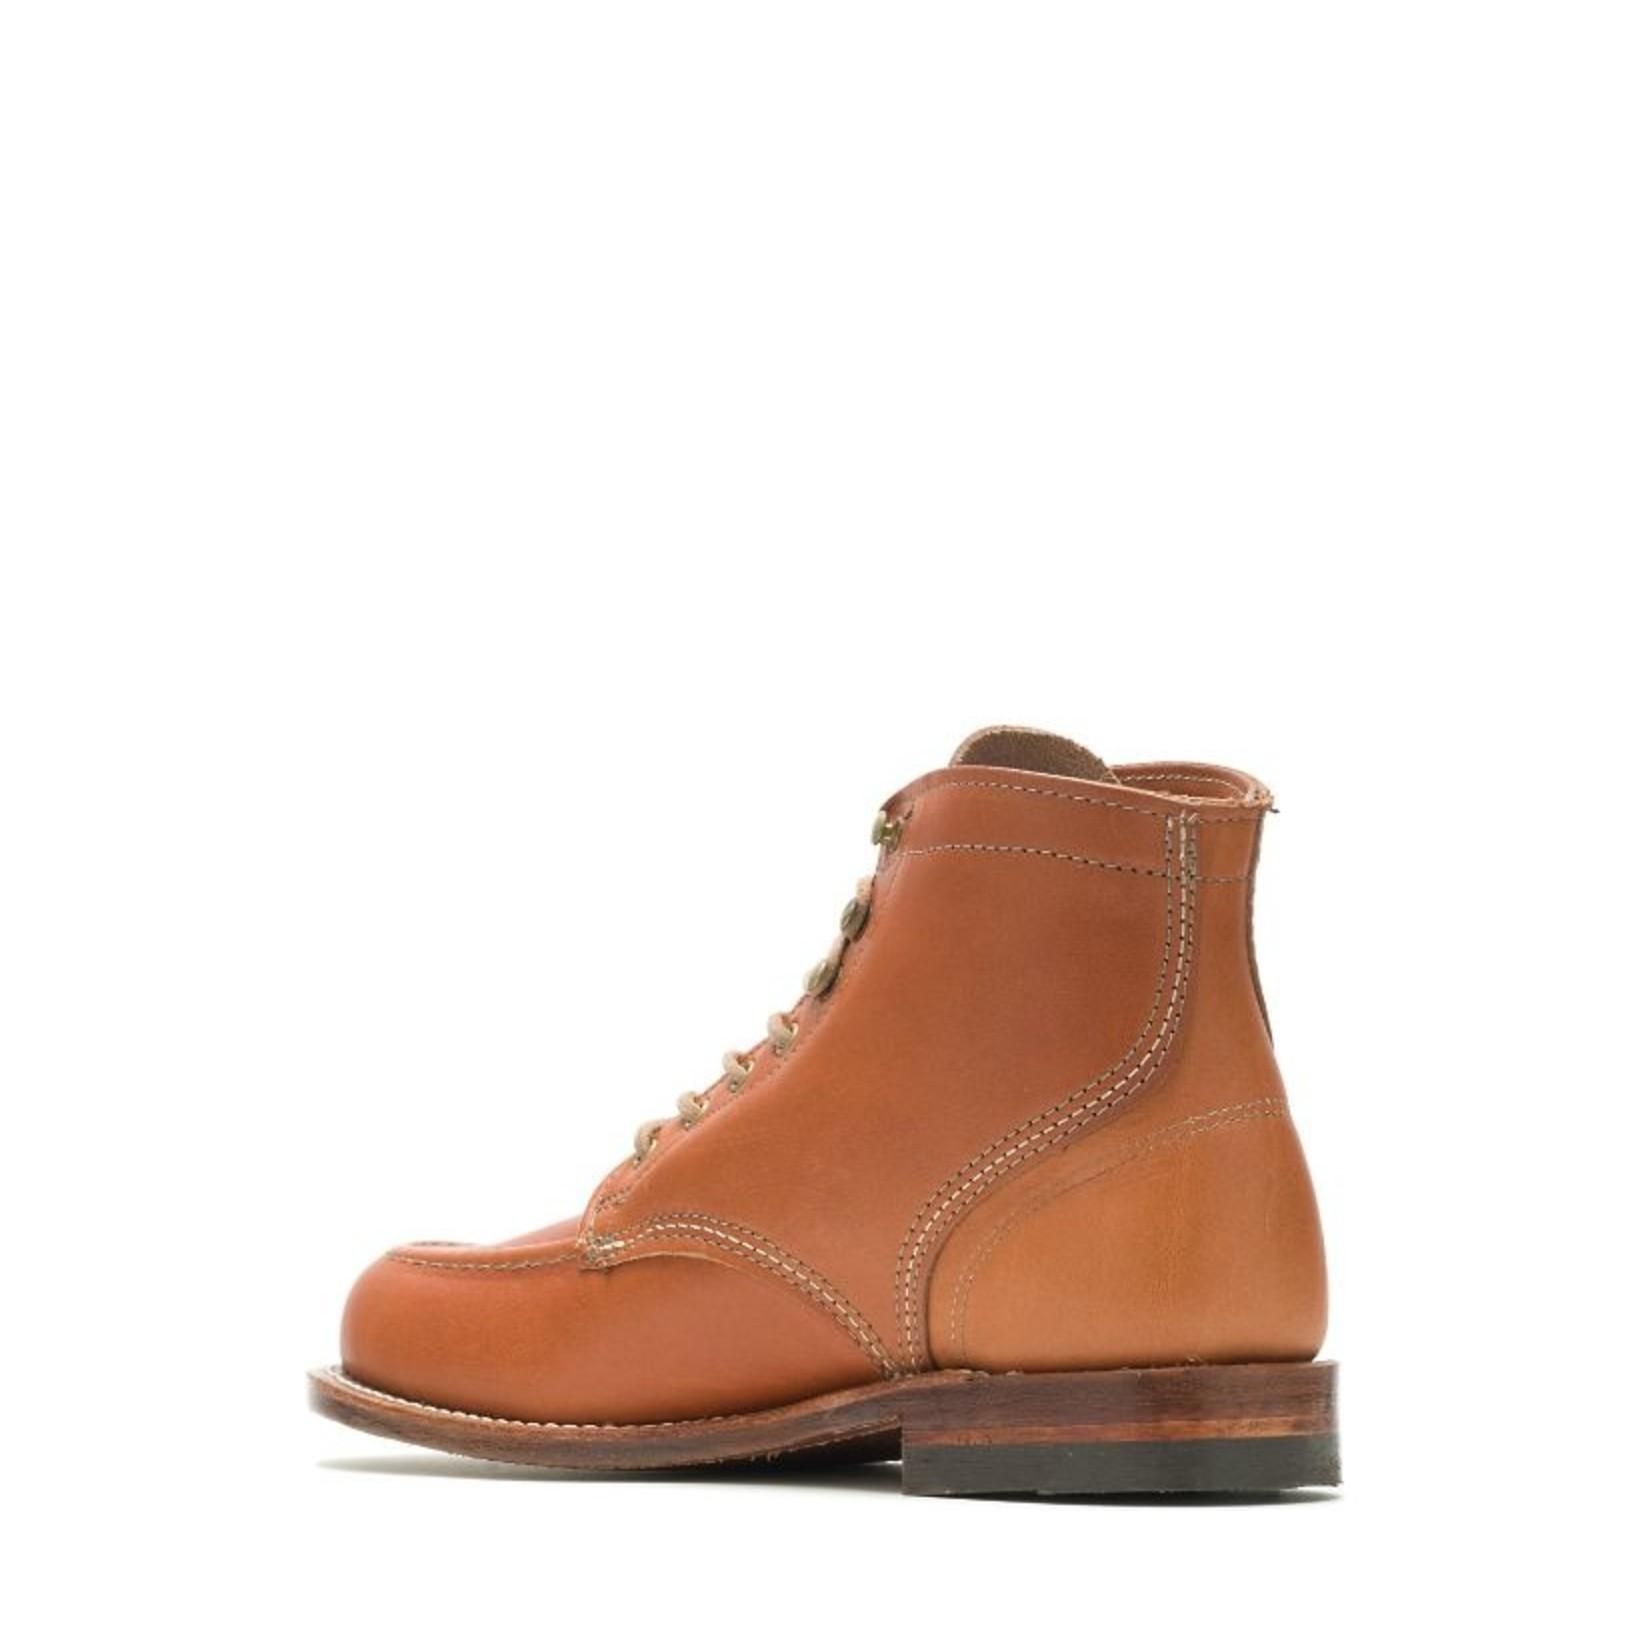 Men's Wolverine 1000 Mile 1940 Boot Tan W40503